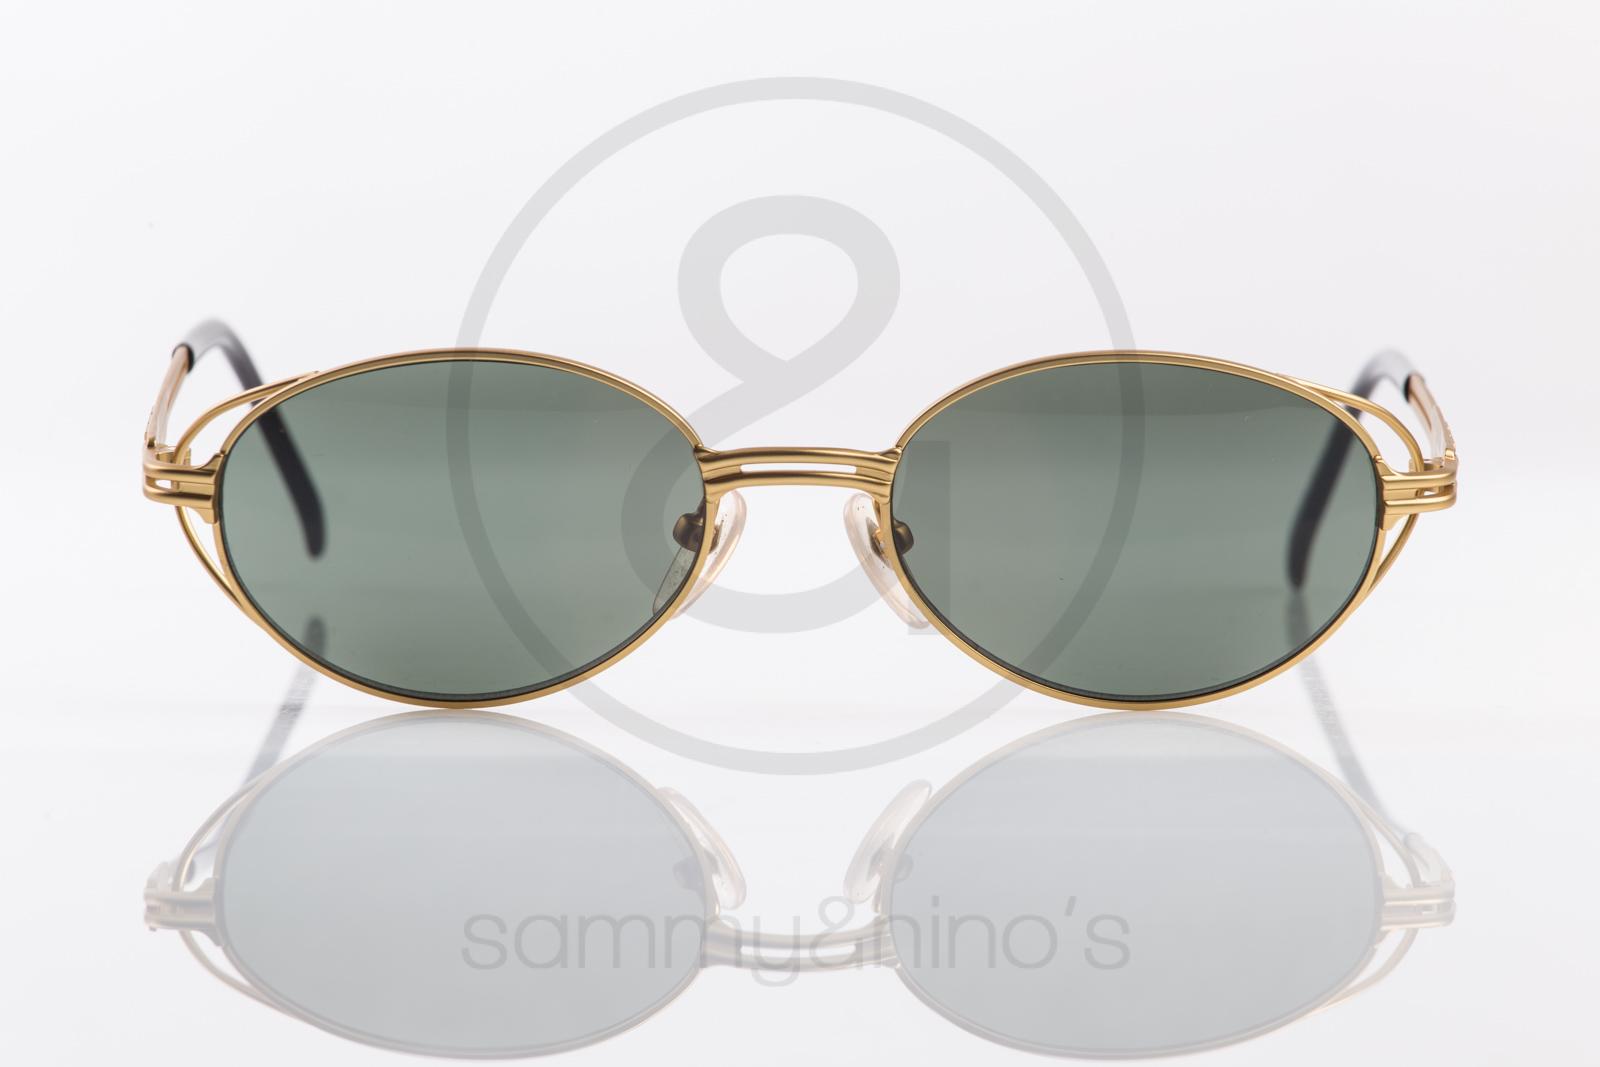 Jean Paul Gaultier 58 6106 Sammy Amp Nino S Store